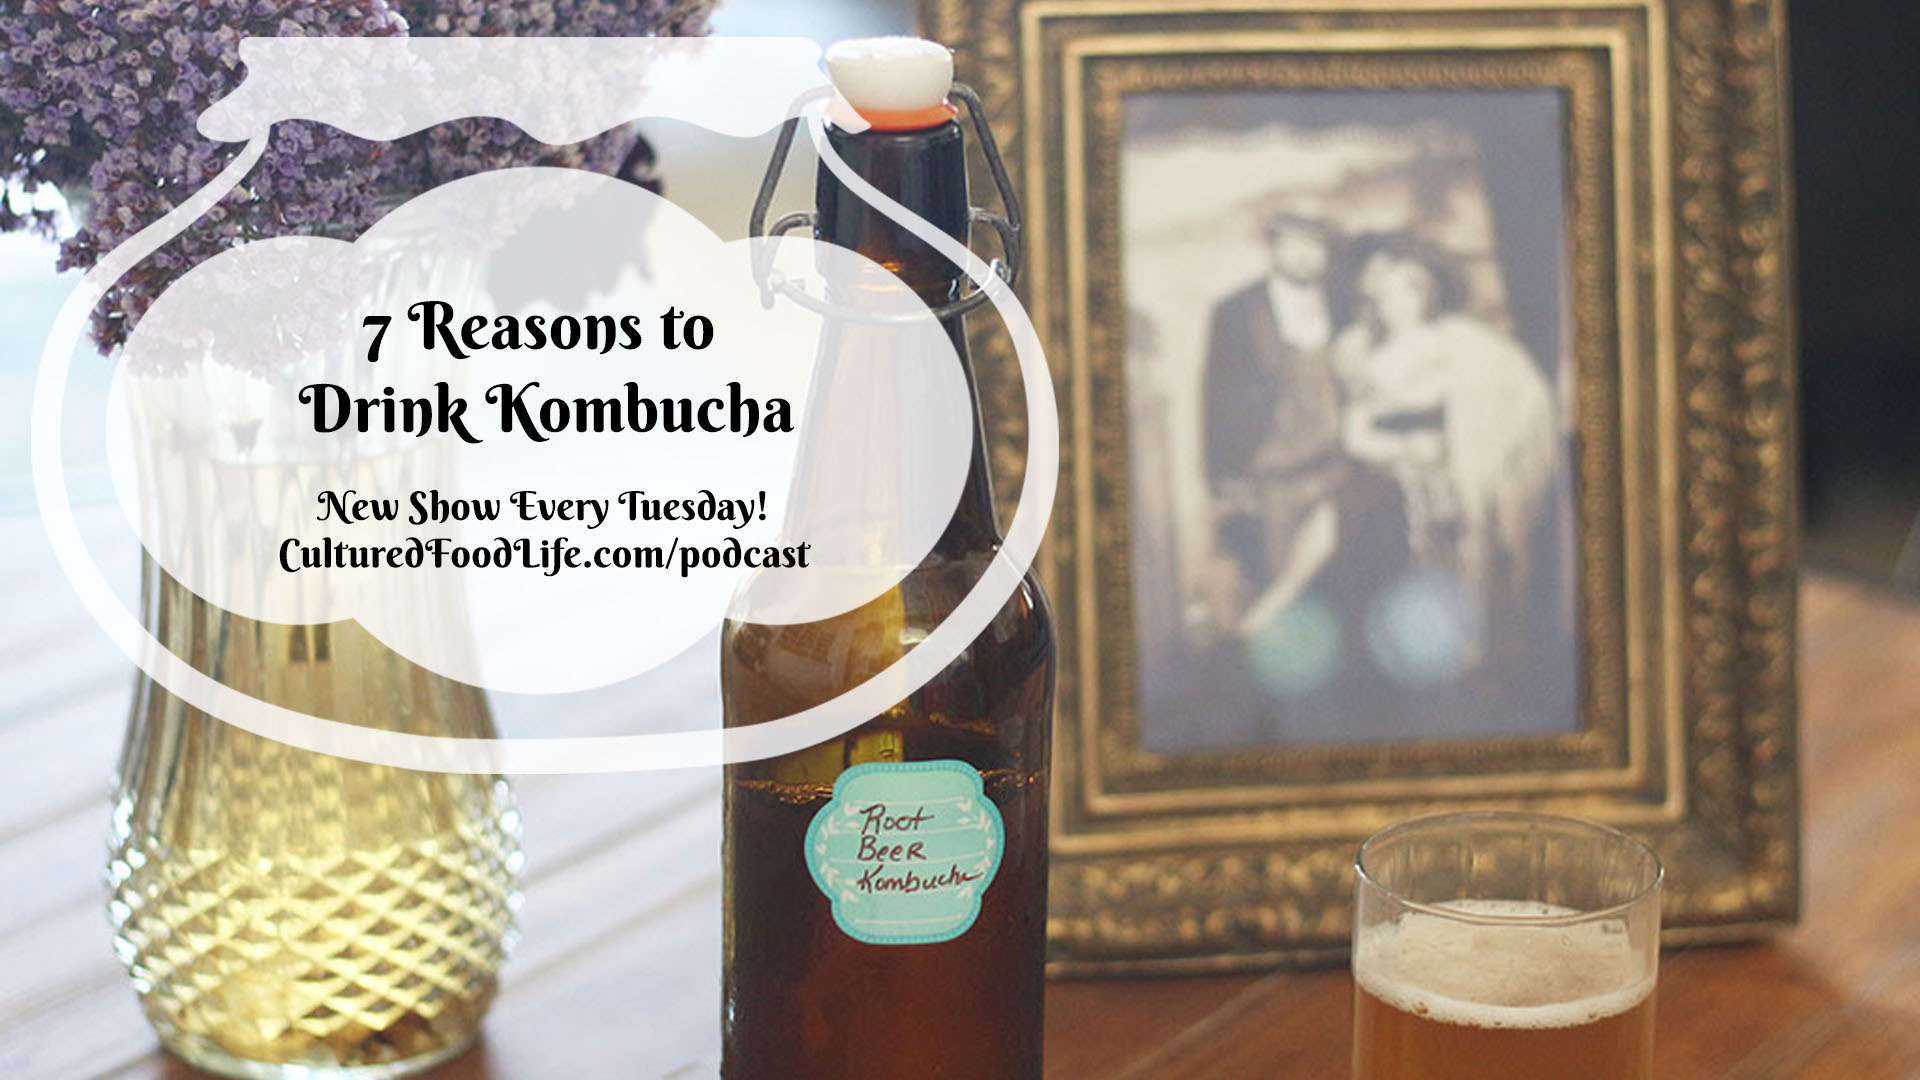 7 Reasons to Drink Kombucha full